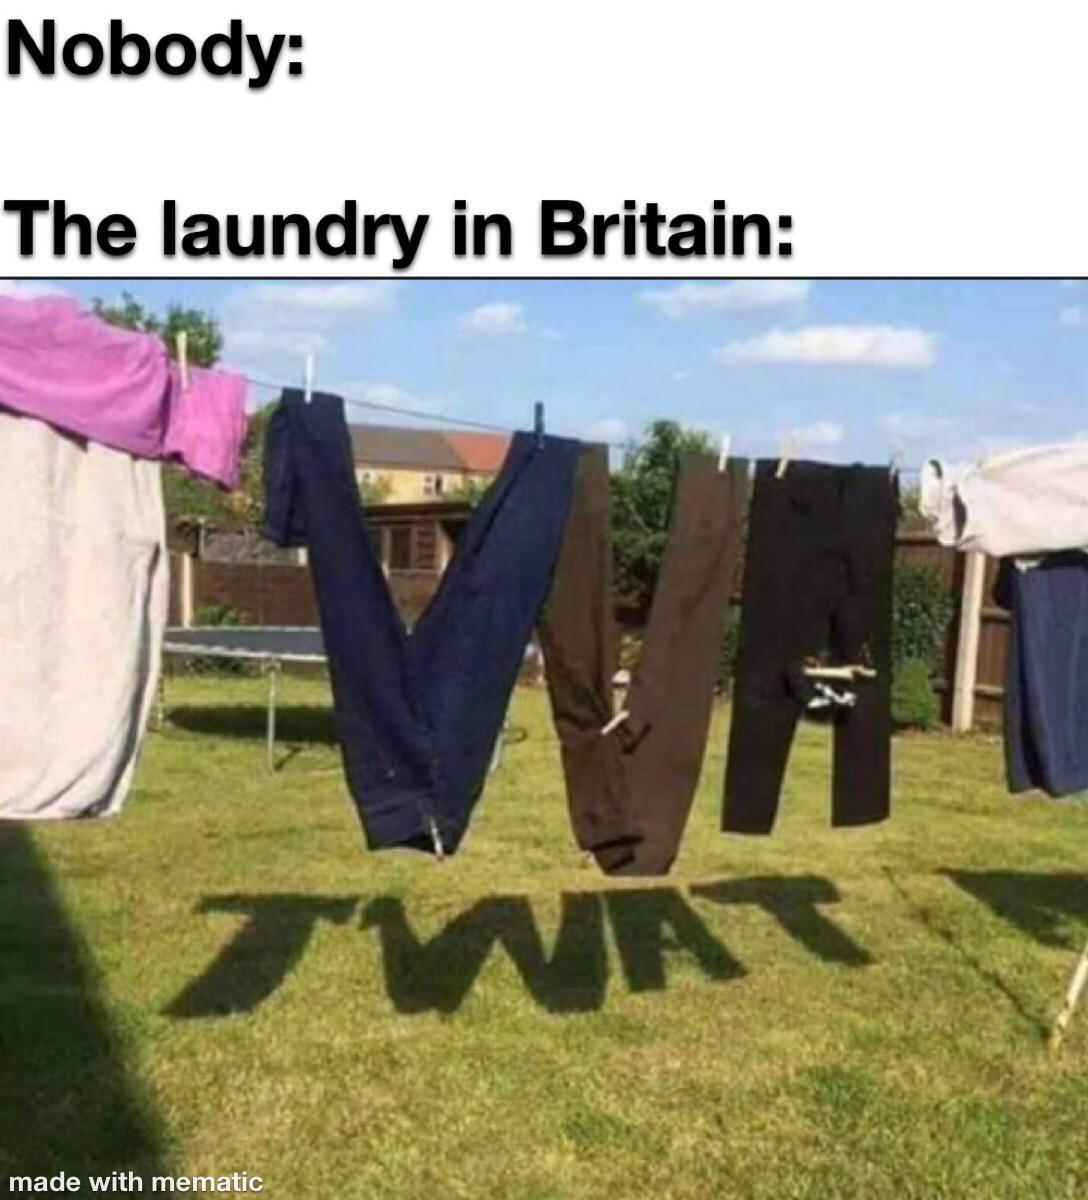 Where the swears flow like water #dankmemes #memes #memesdaily https://t.co/HRPCQaUWW4 https://t.co/G7qkxpPuvJ